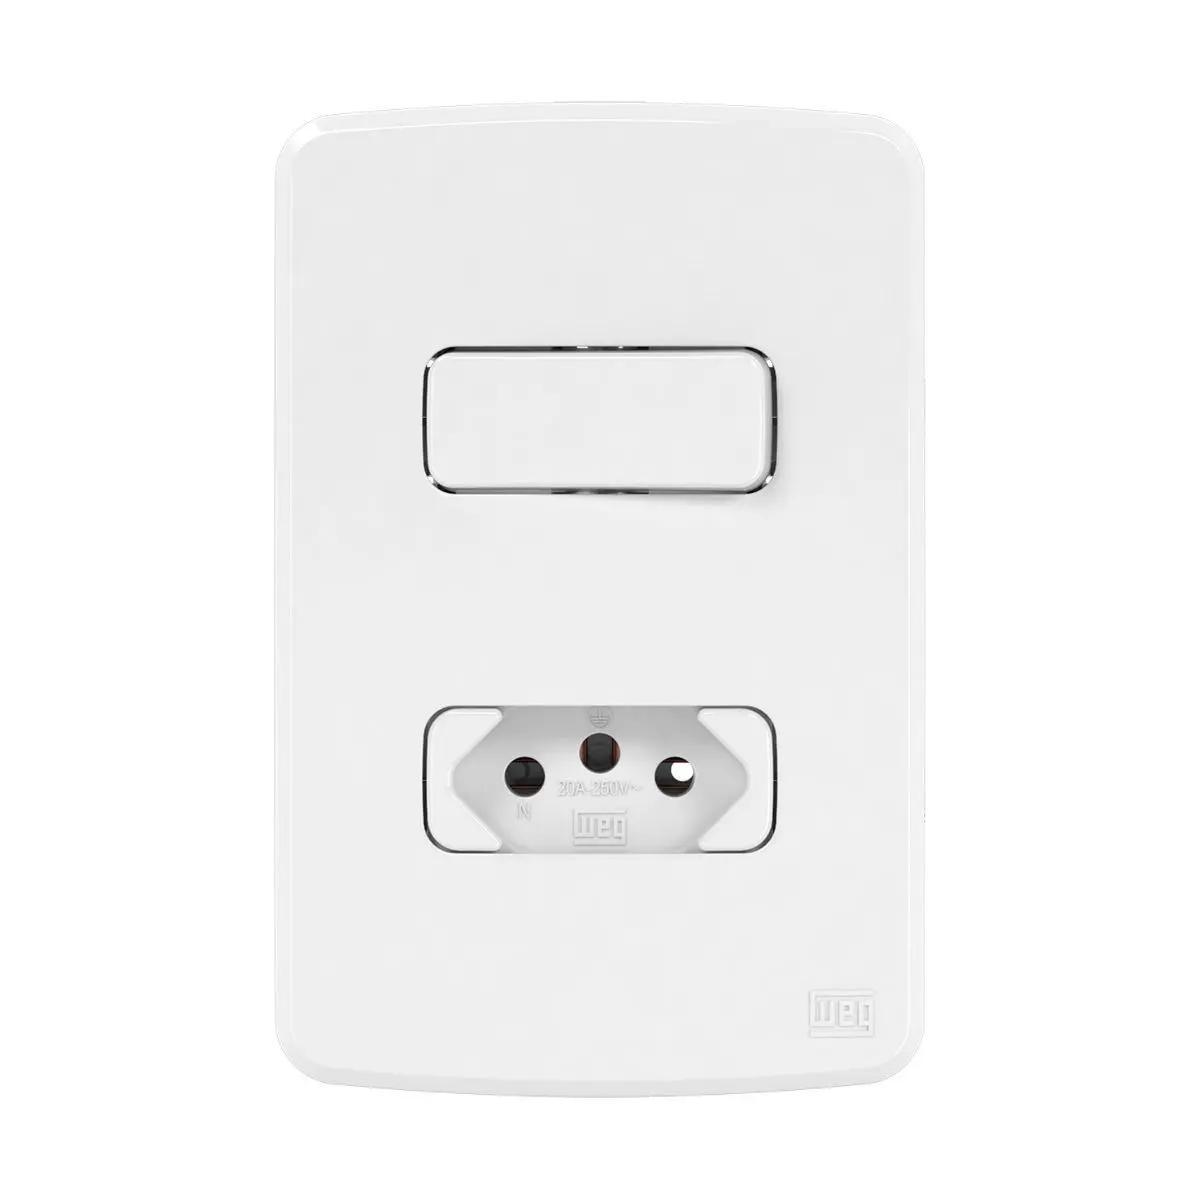 1 Interruptor Simples+Tomada 20A Placa 4X2 Composé Br